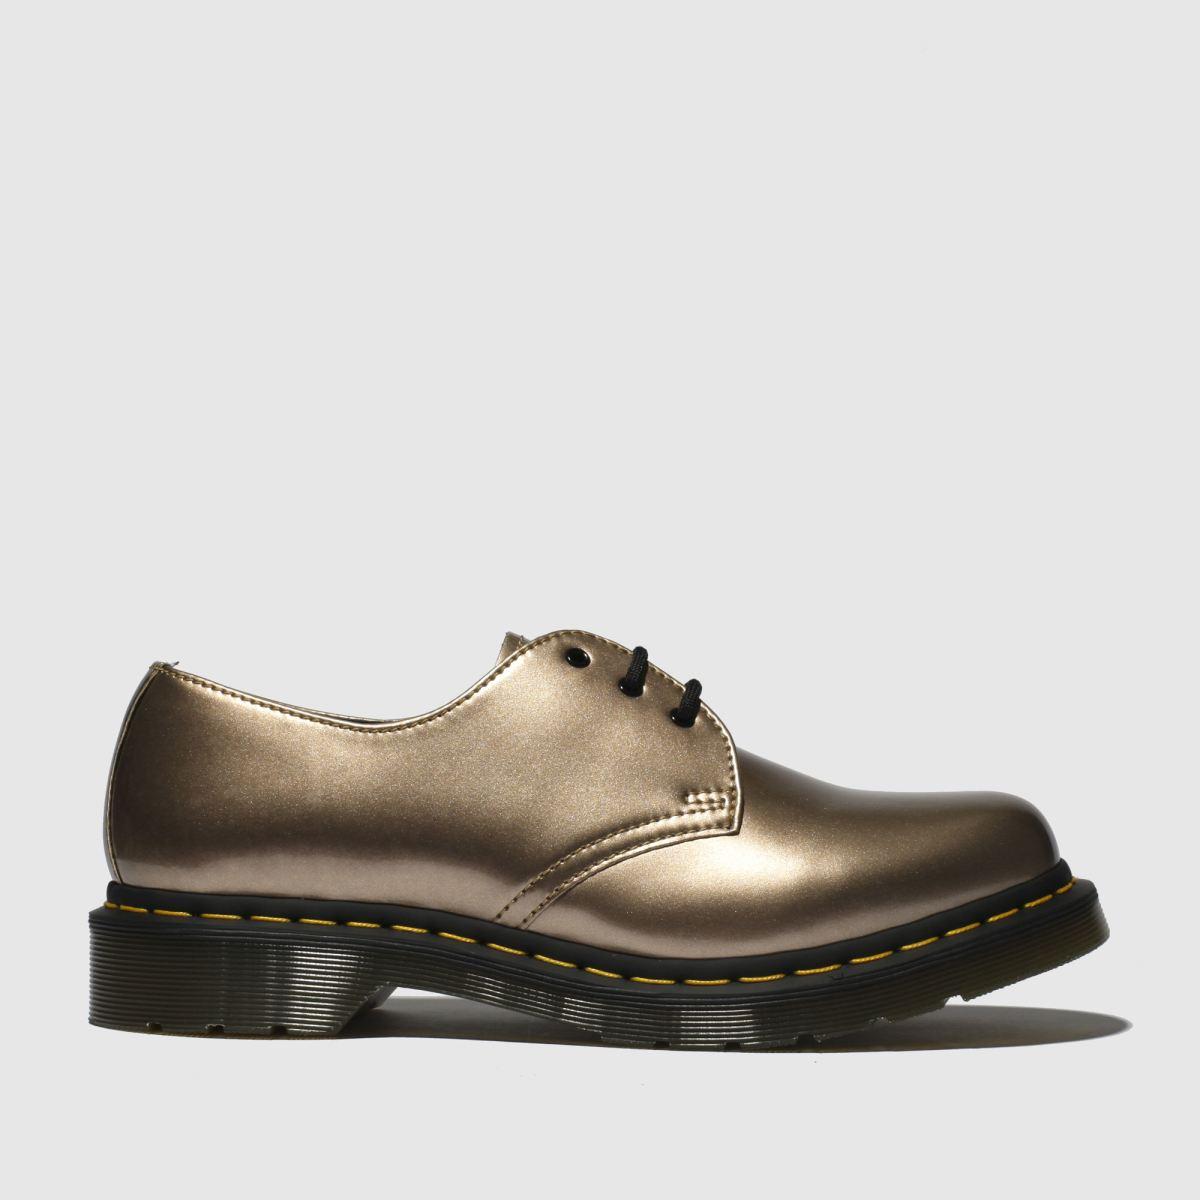 Dr Martens Gold 1461 Vegan Chrome Flat Shoes